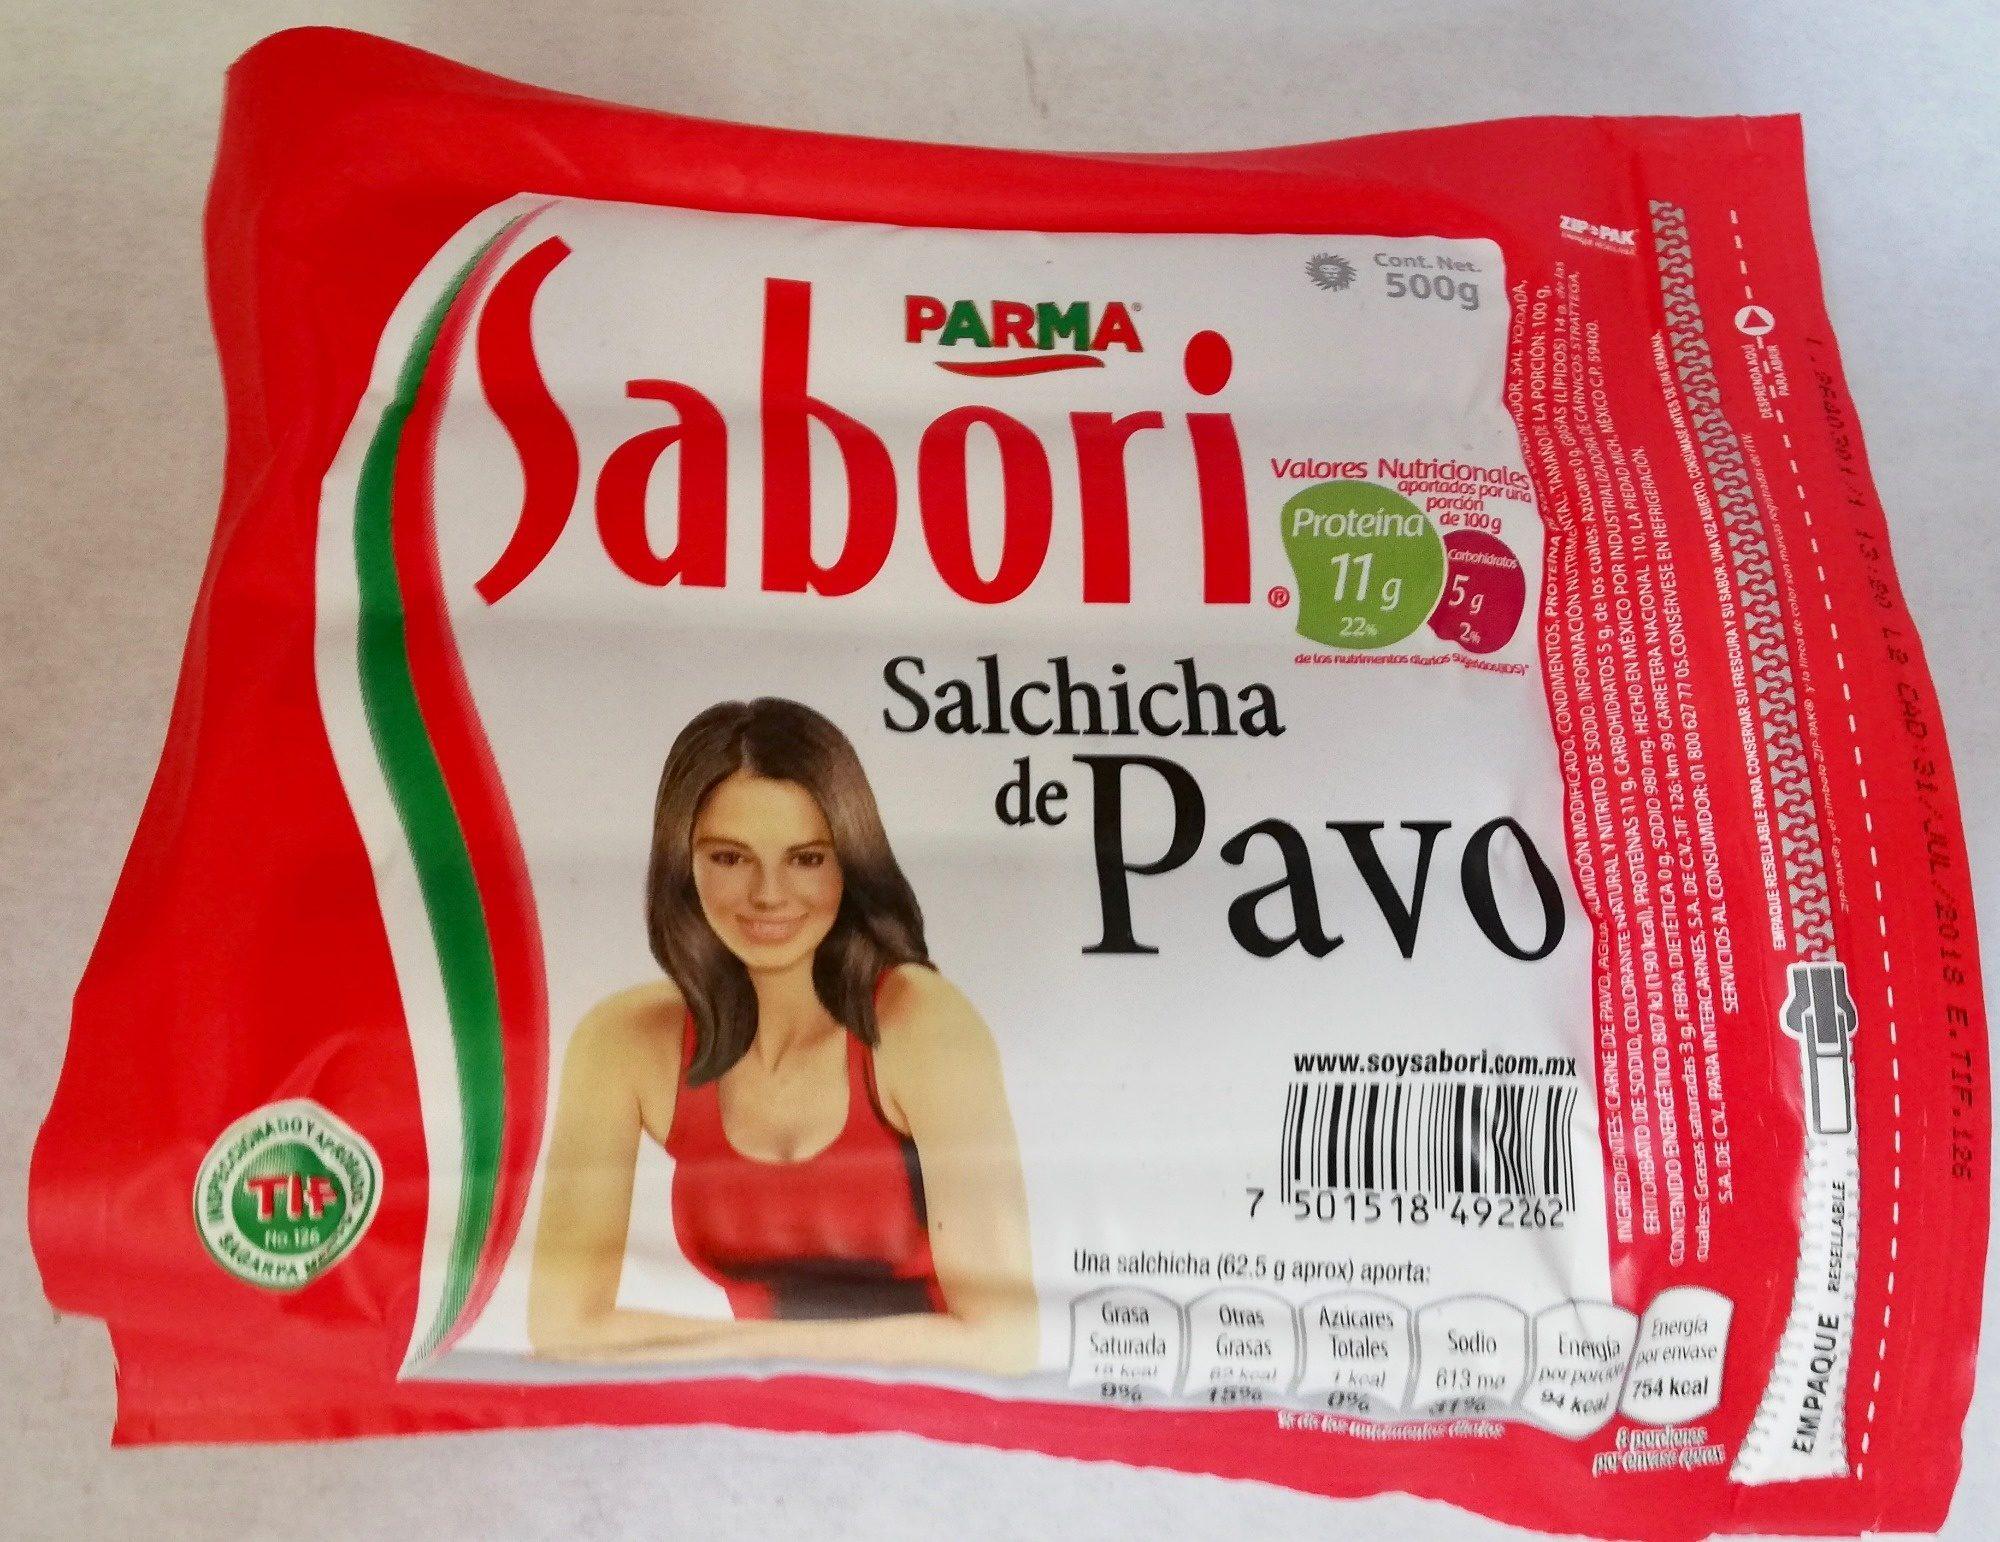 Sabori salchicha de pavo - Parma - 500 g